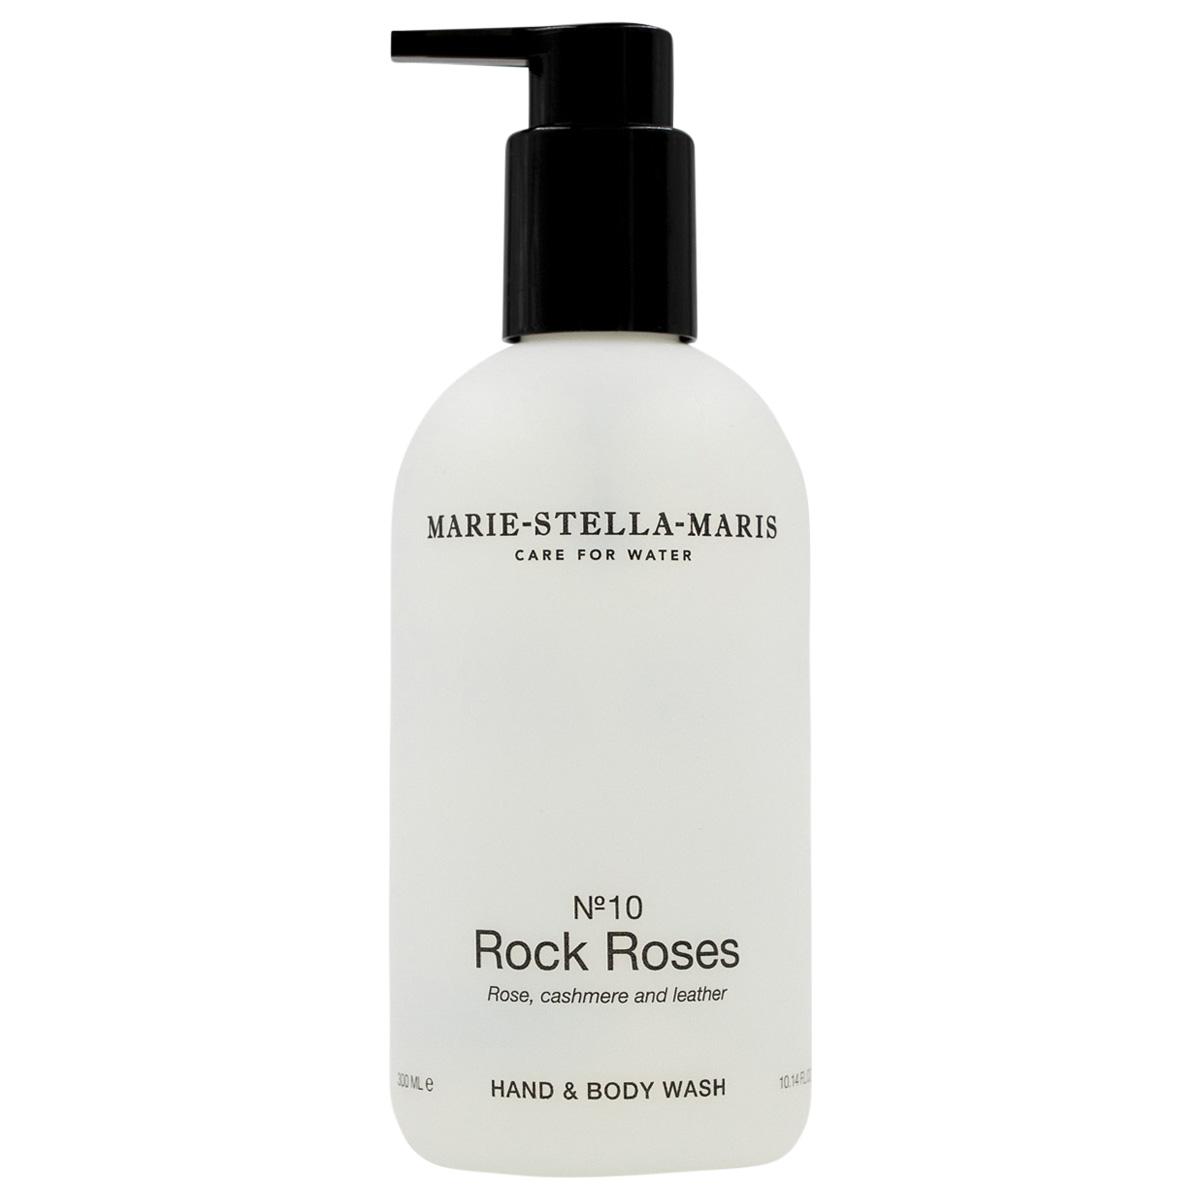 No.10 Hand & Body Wash Rock Roses